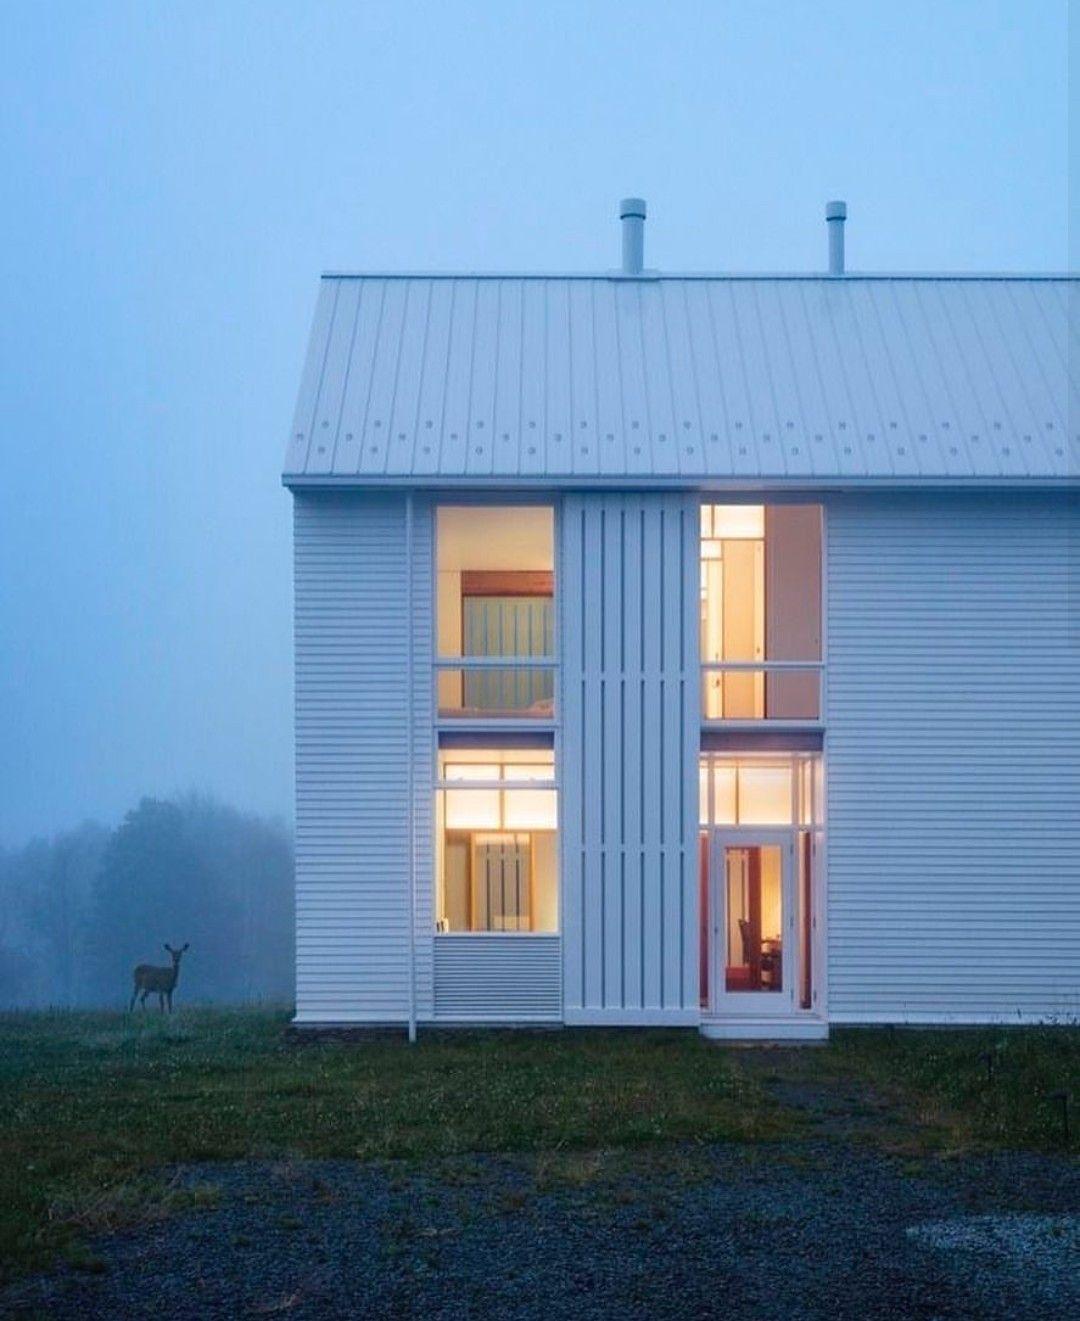 Image 9 Of 13 From Gallery Pennsylvania Farmhouse Cutler Anderson Architects Photograph By David Sundberg ESTO